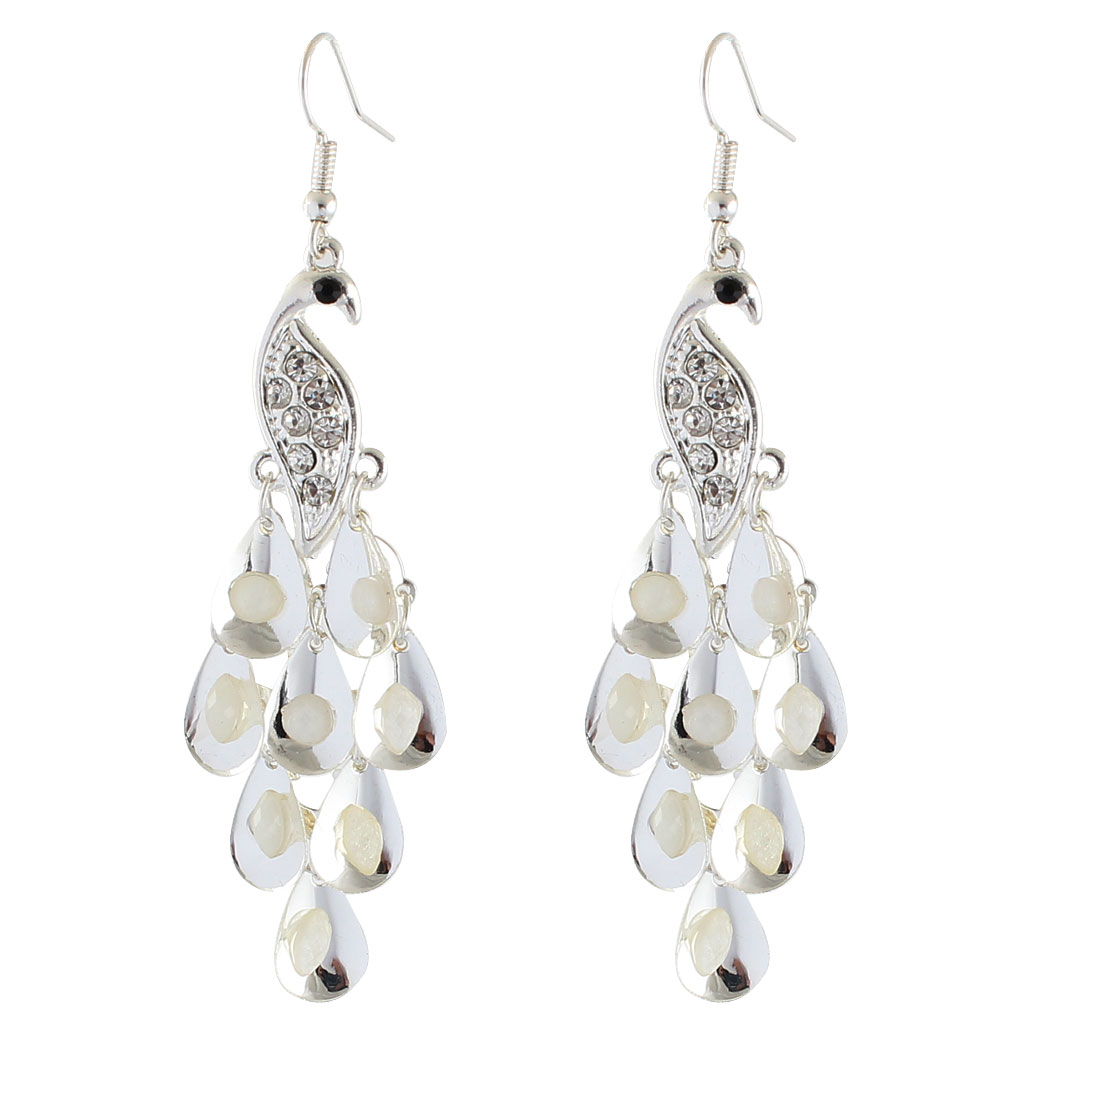 Women Metal Peacock Designed Rhinestone Inlaid Ornament Hook Earrings Silver Tone Pair